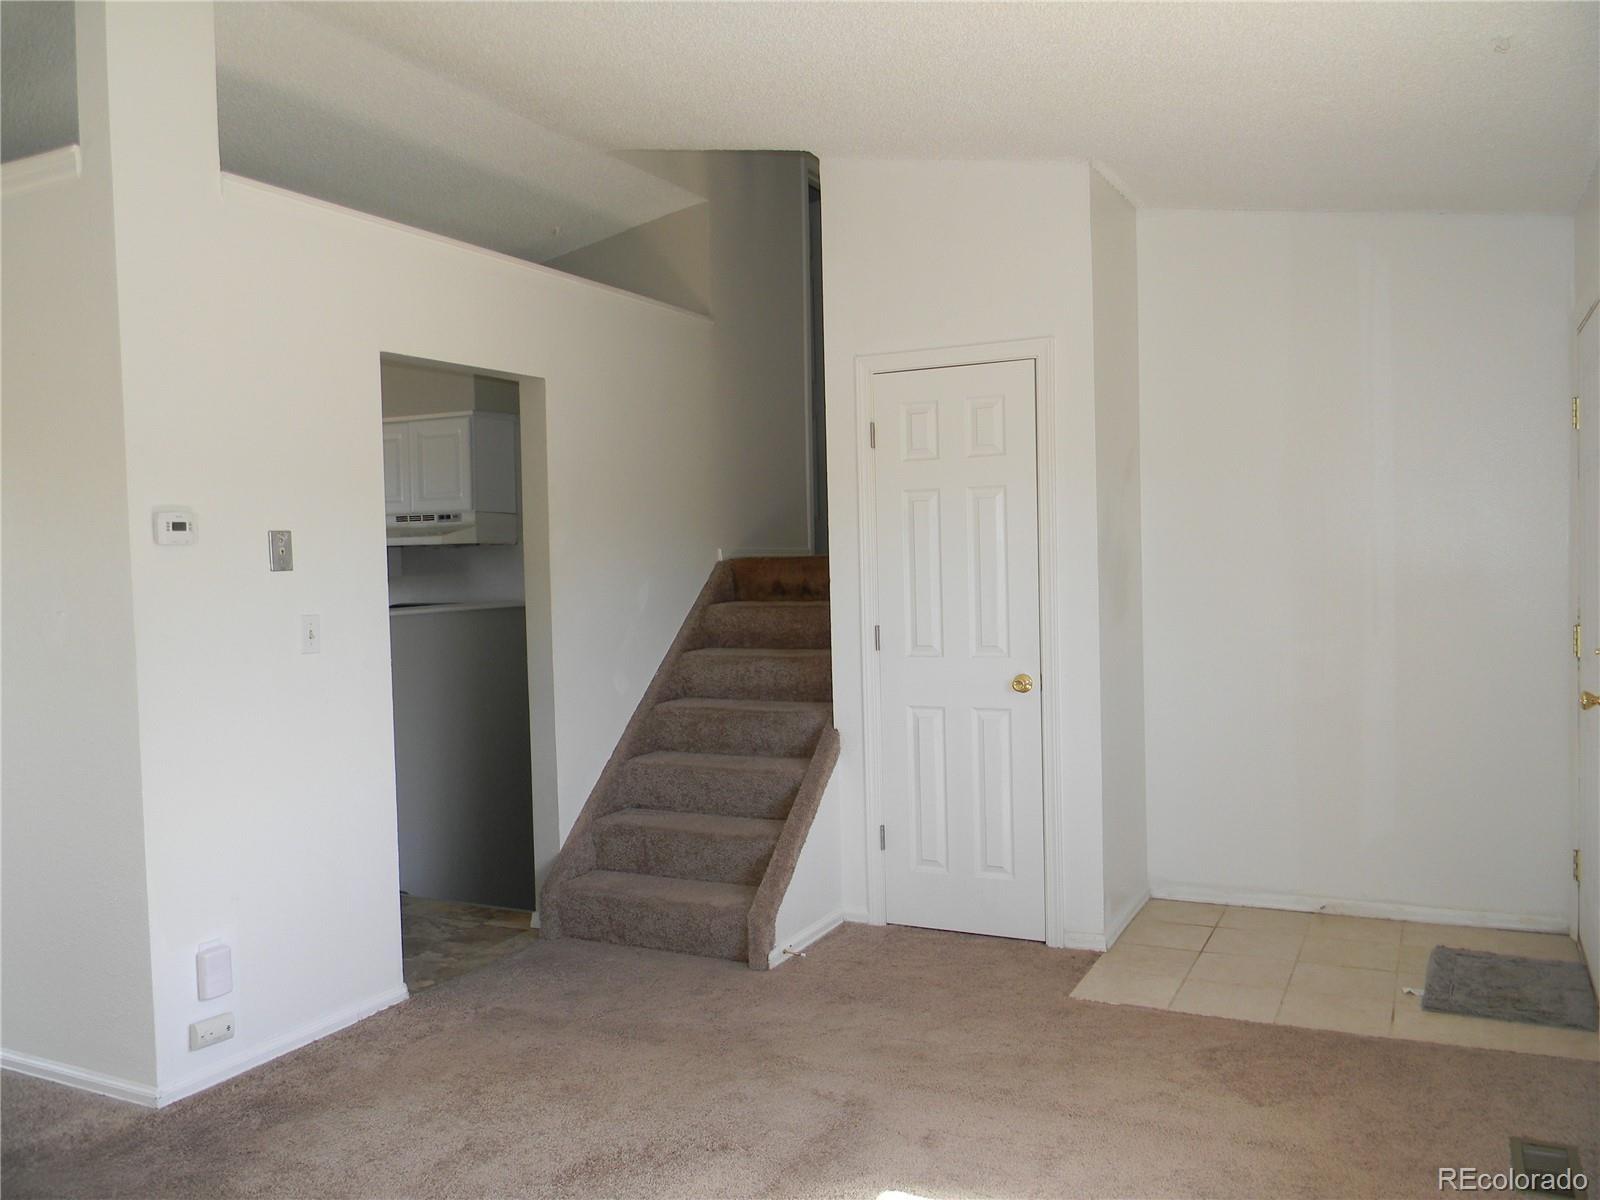 MLS# 5946356 - 6 - 4920 Ridenour Drive, Colorado Springs, CO 80916